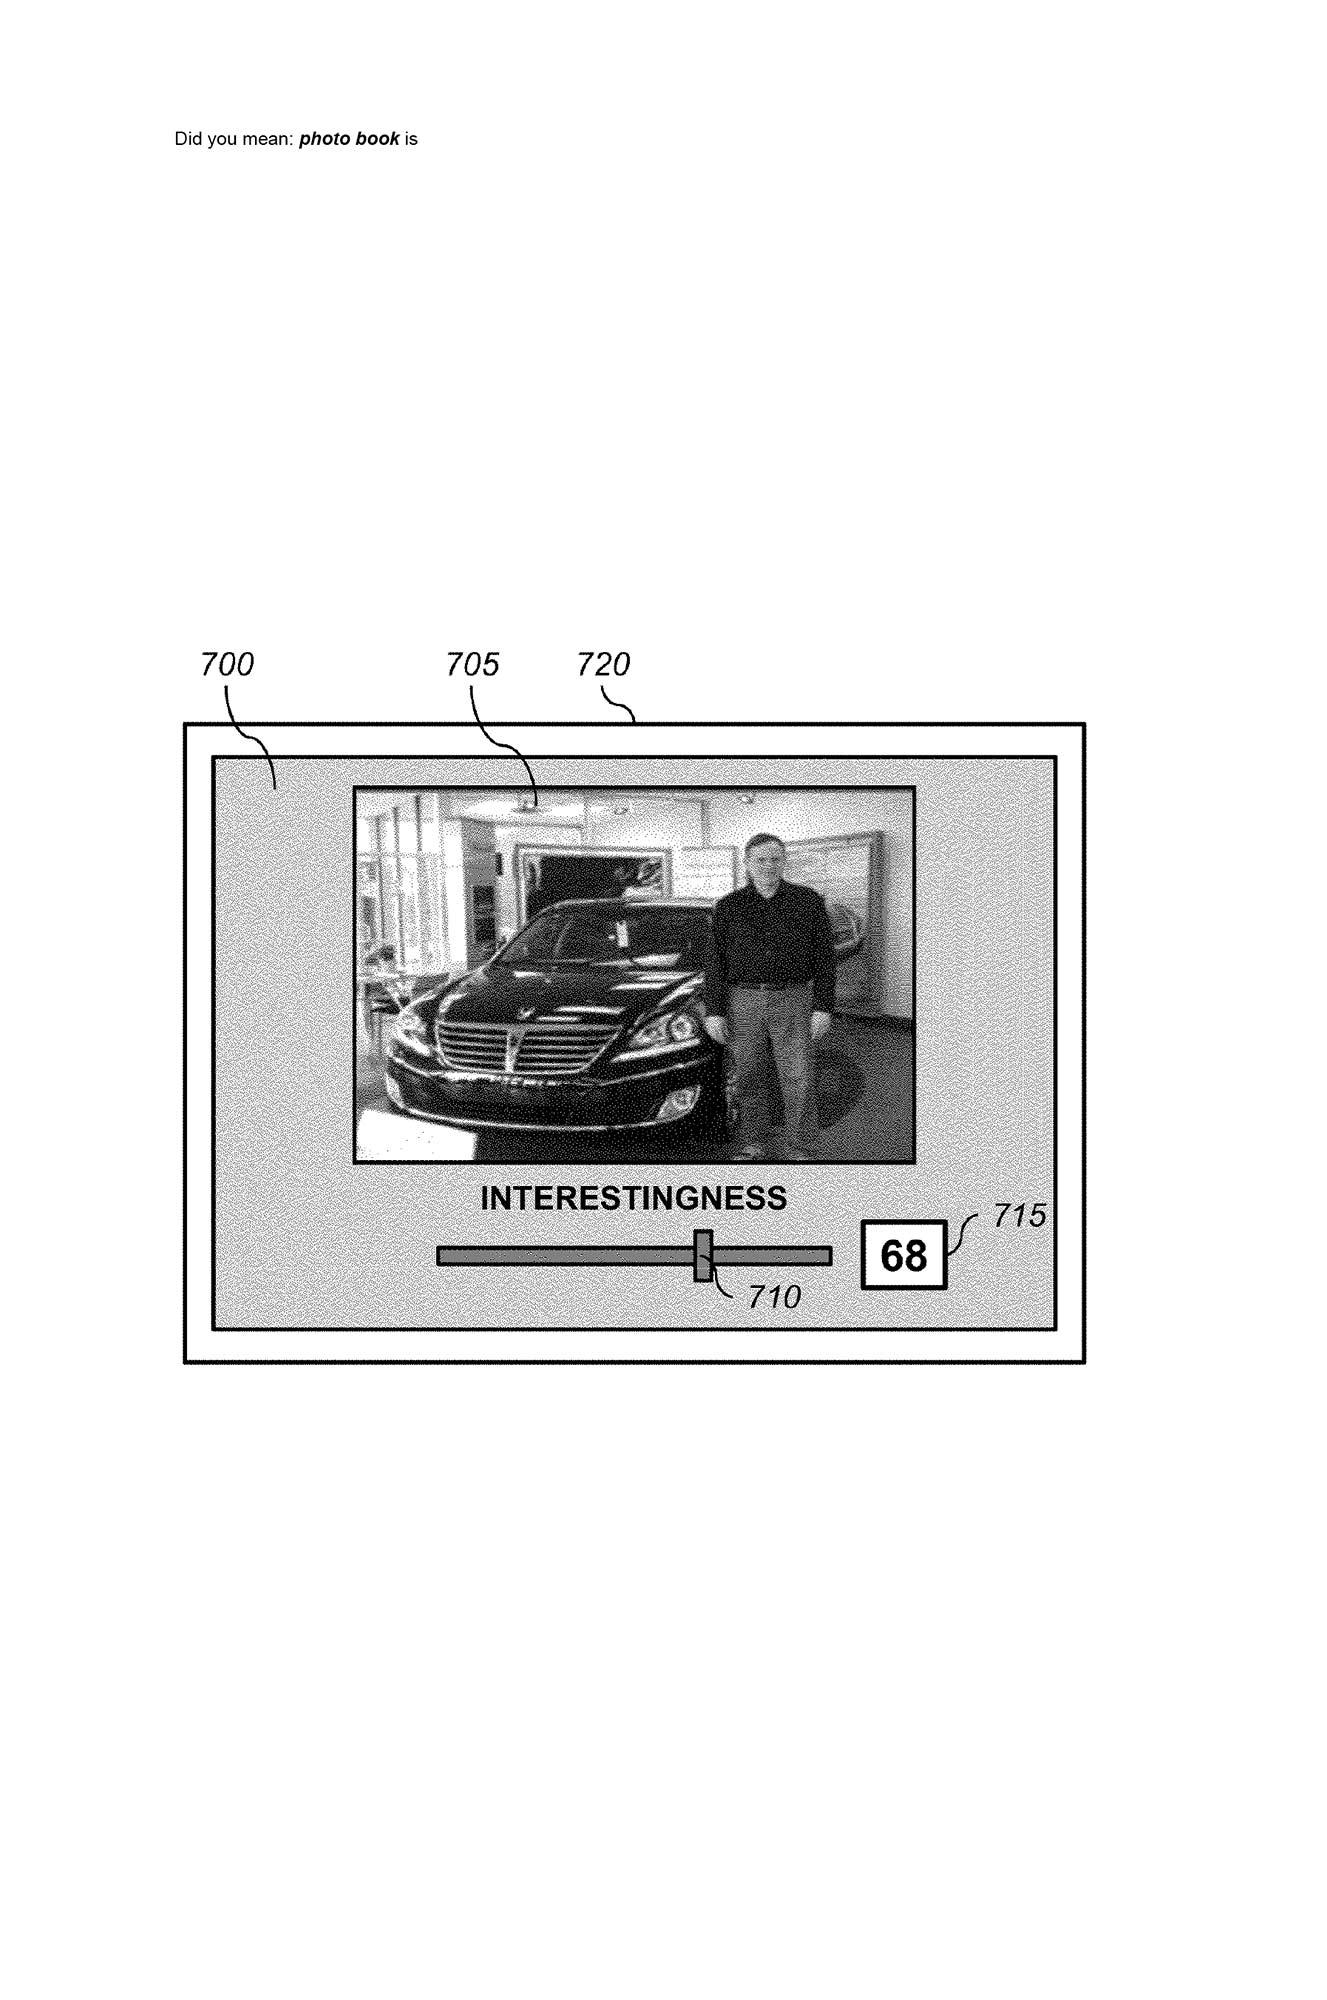 msdm-photobook-is-p467